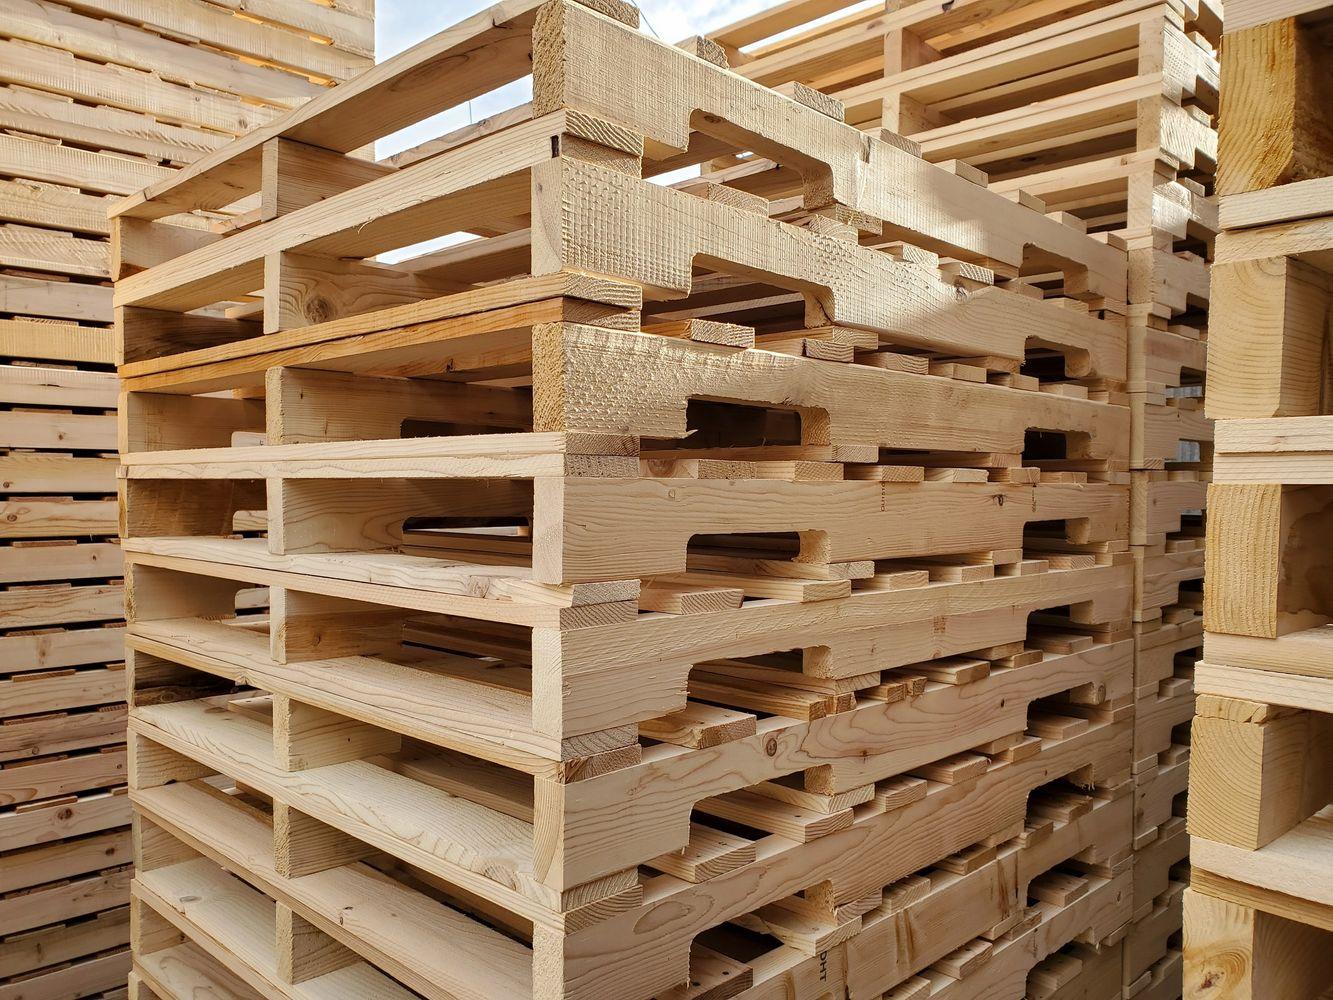 Century Pallets - Pallet Supplier, Wooden Pallets, Pallets for Sale